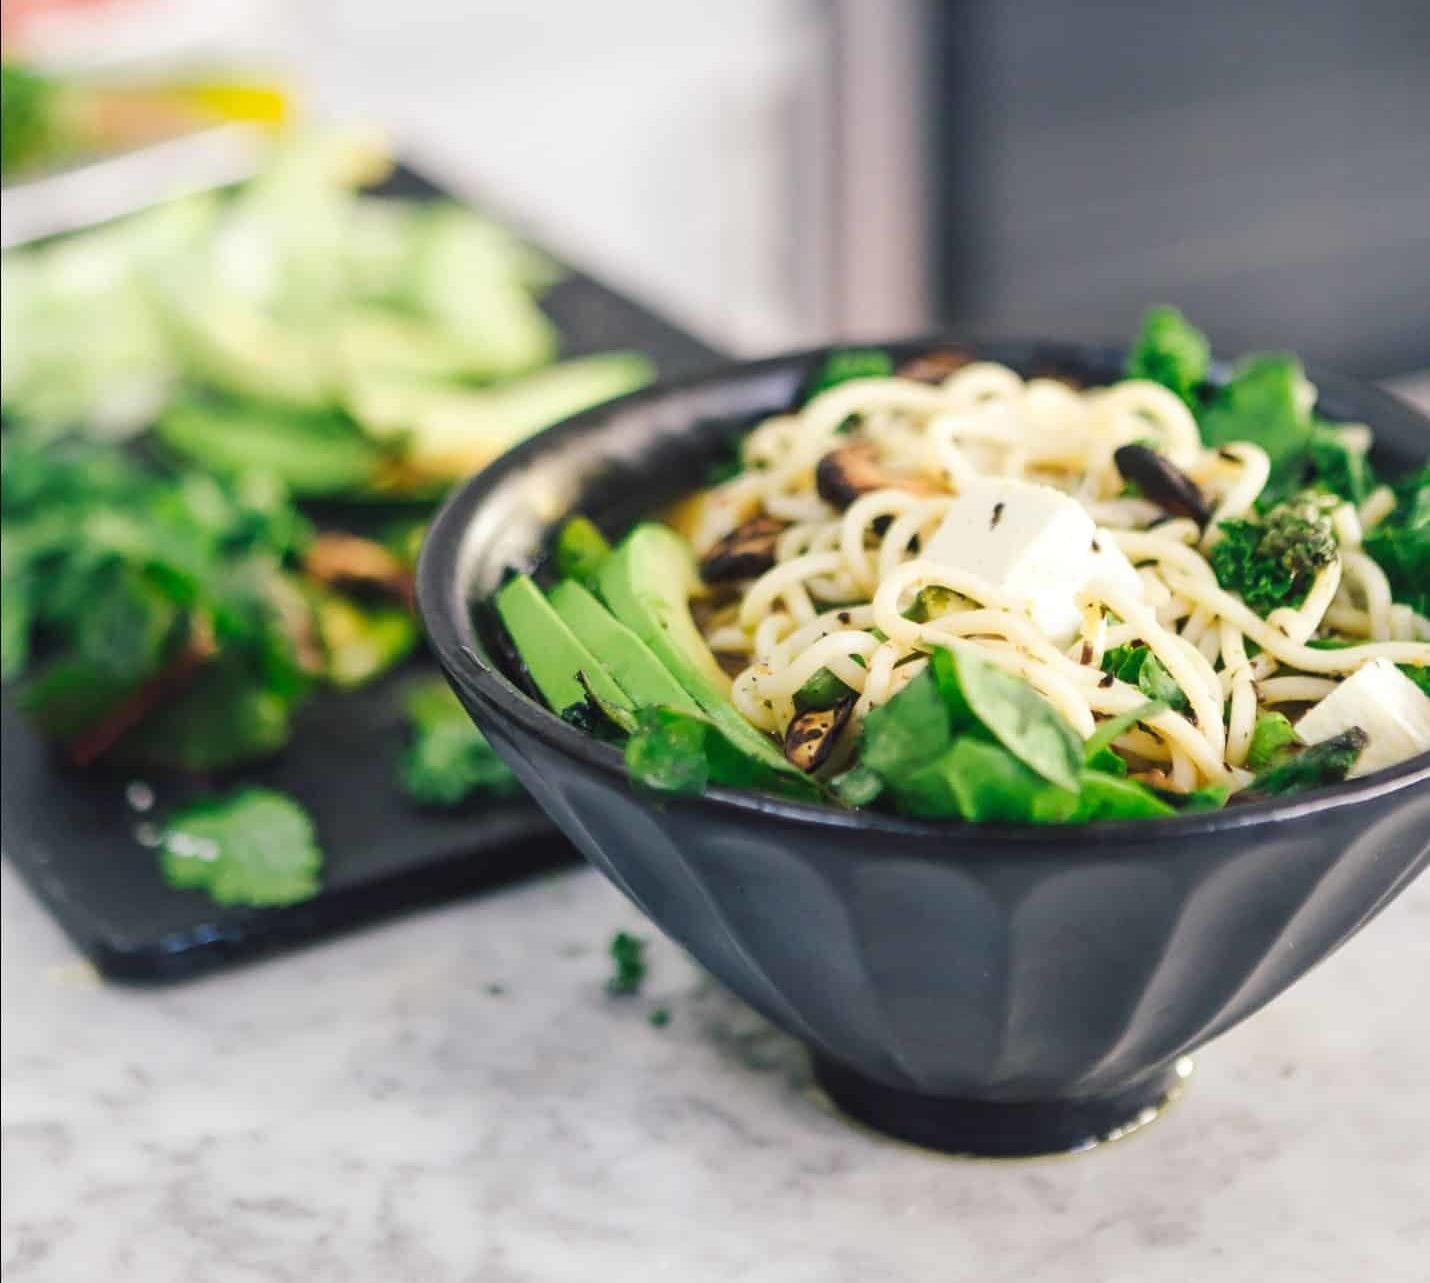 Ramen with Veggies in a Bowl